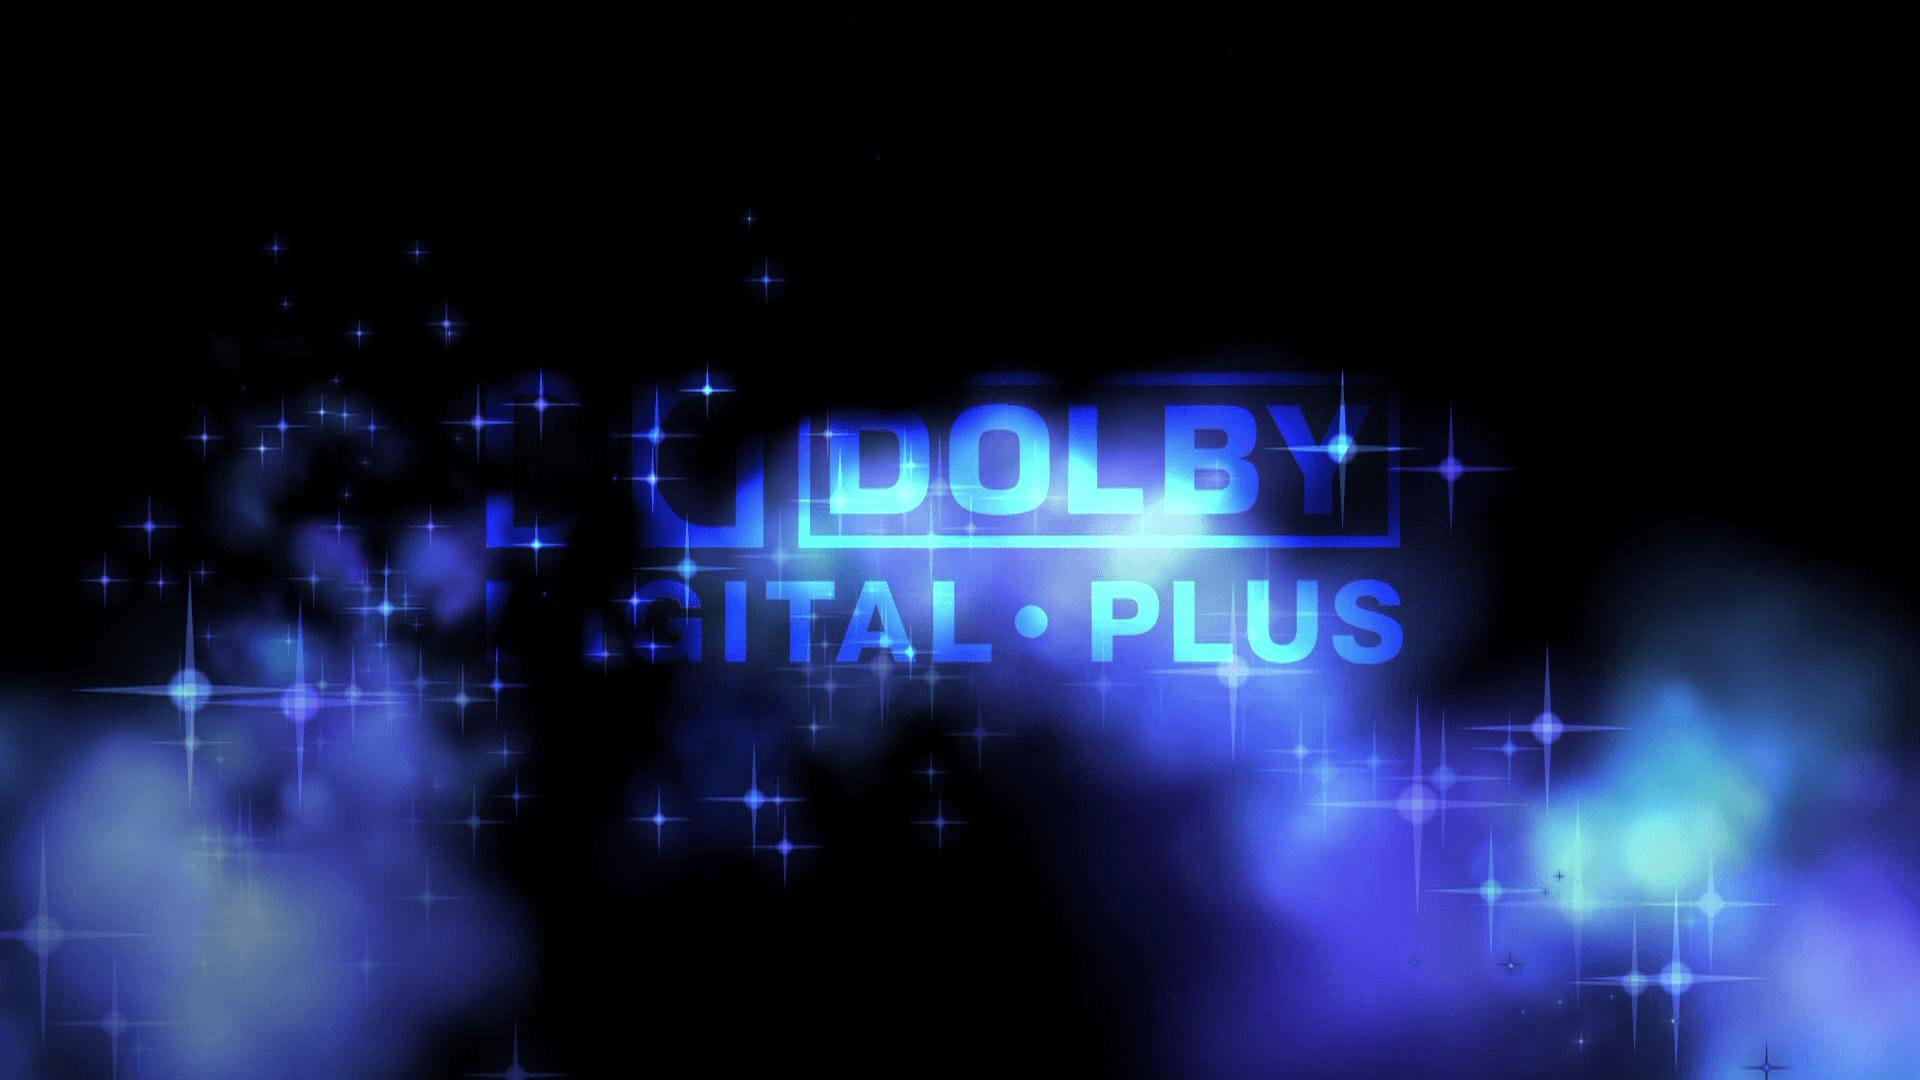 Dolby Digital Wallpapers - Top Free Dolby Digital